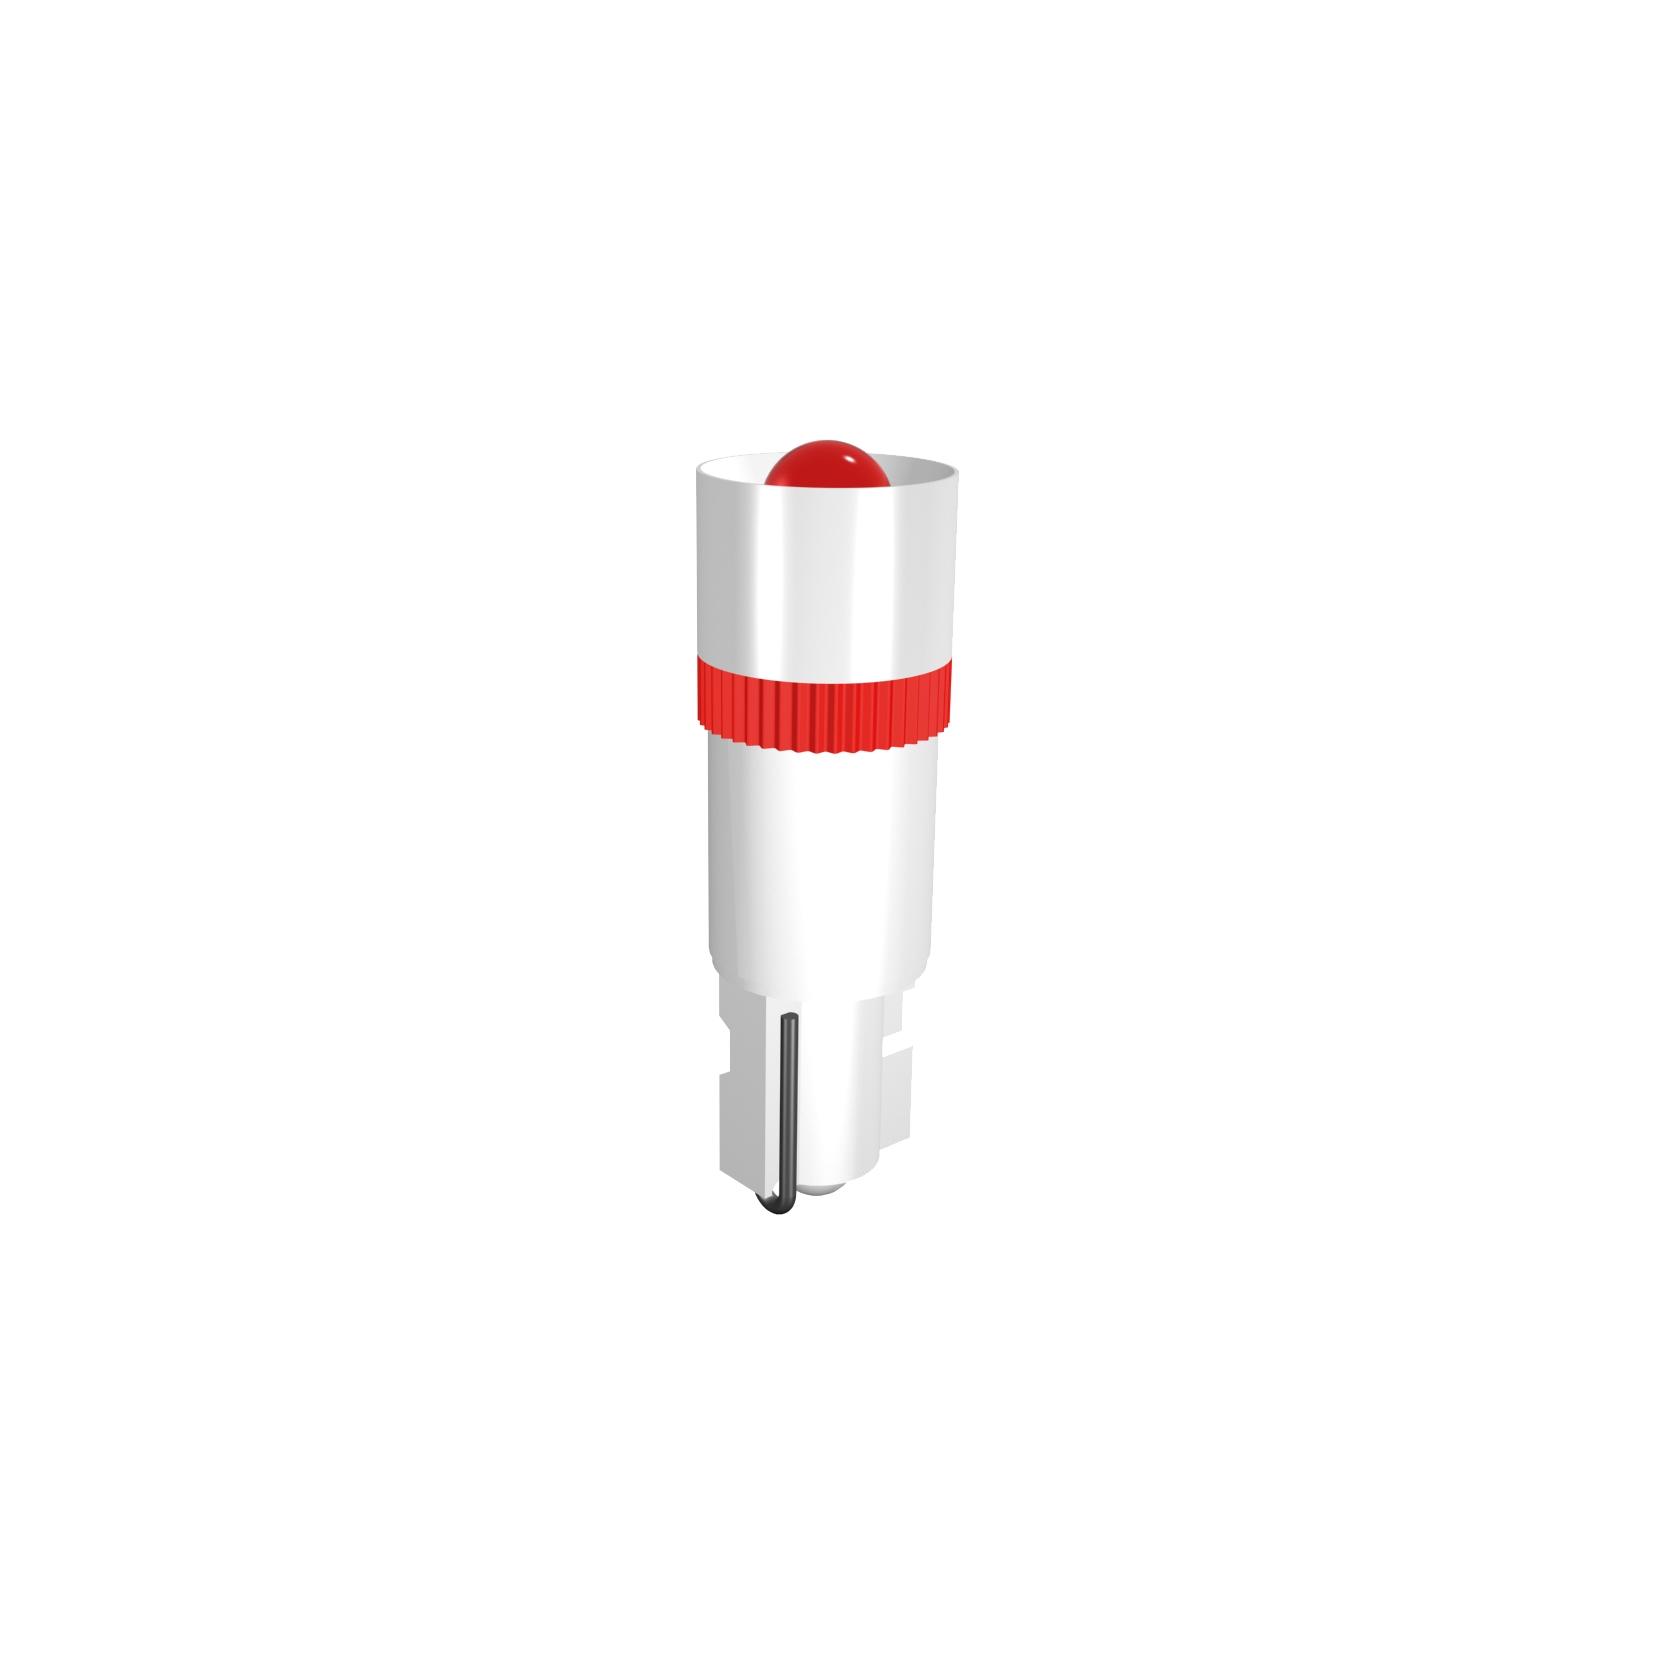 Single-LED Lampe Ø5,6 mm Sockel W2x4,6 Einweggleichrichtung